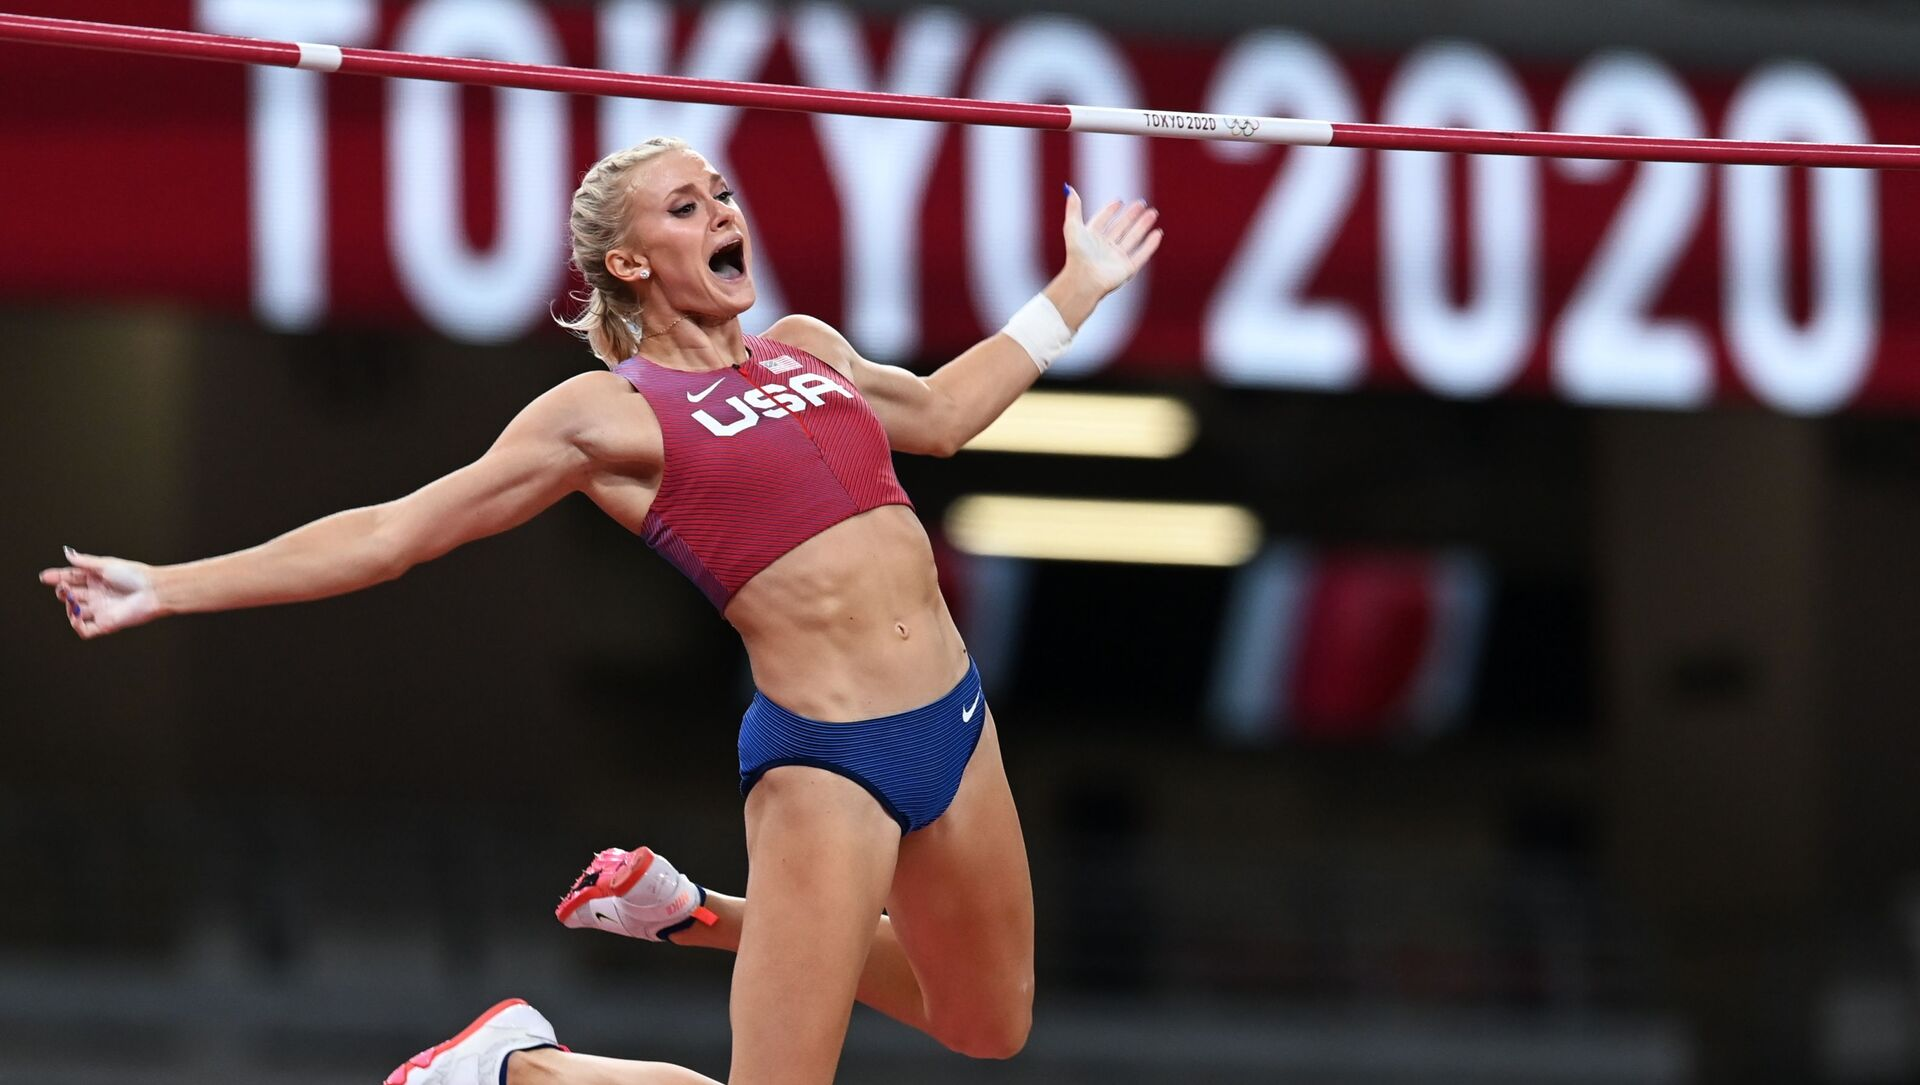 US' Katie Nageotte Wins Women's Pole Vault Gold at Tokyo Olympics - Sputnik International, 1920, 05.08.2021